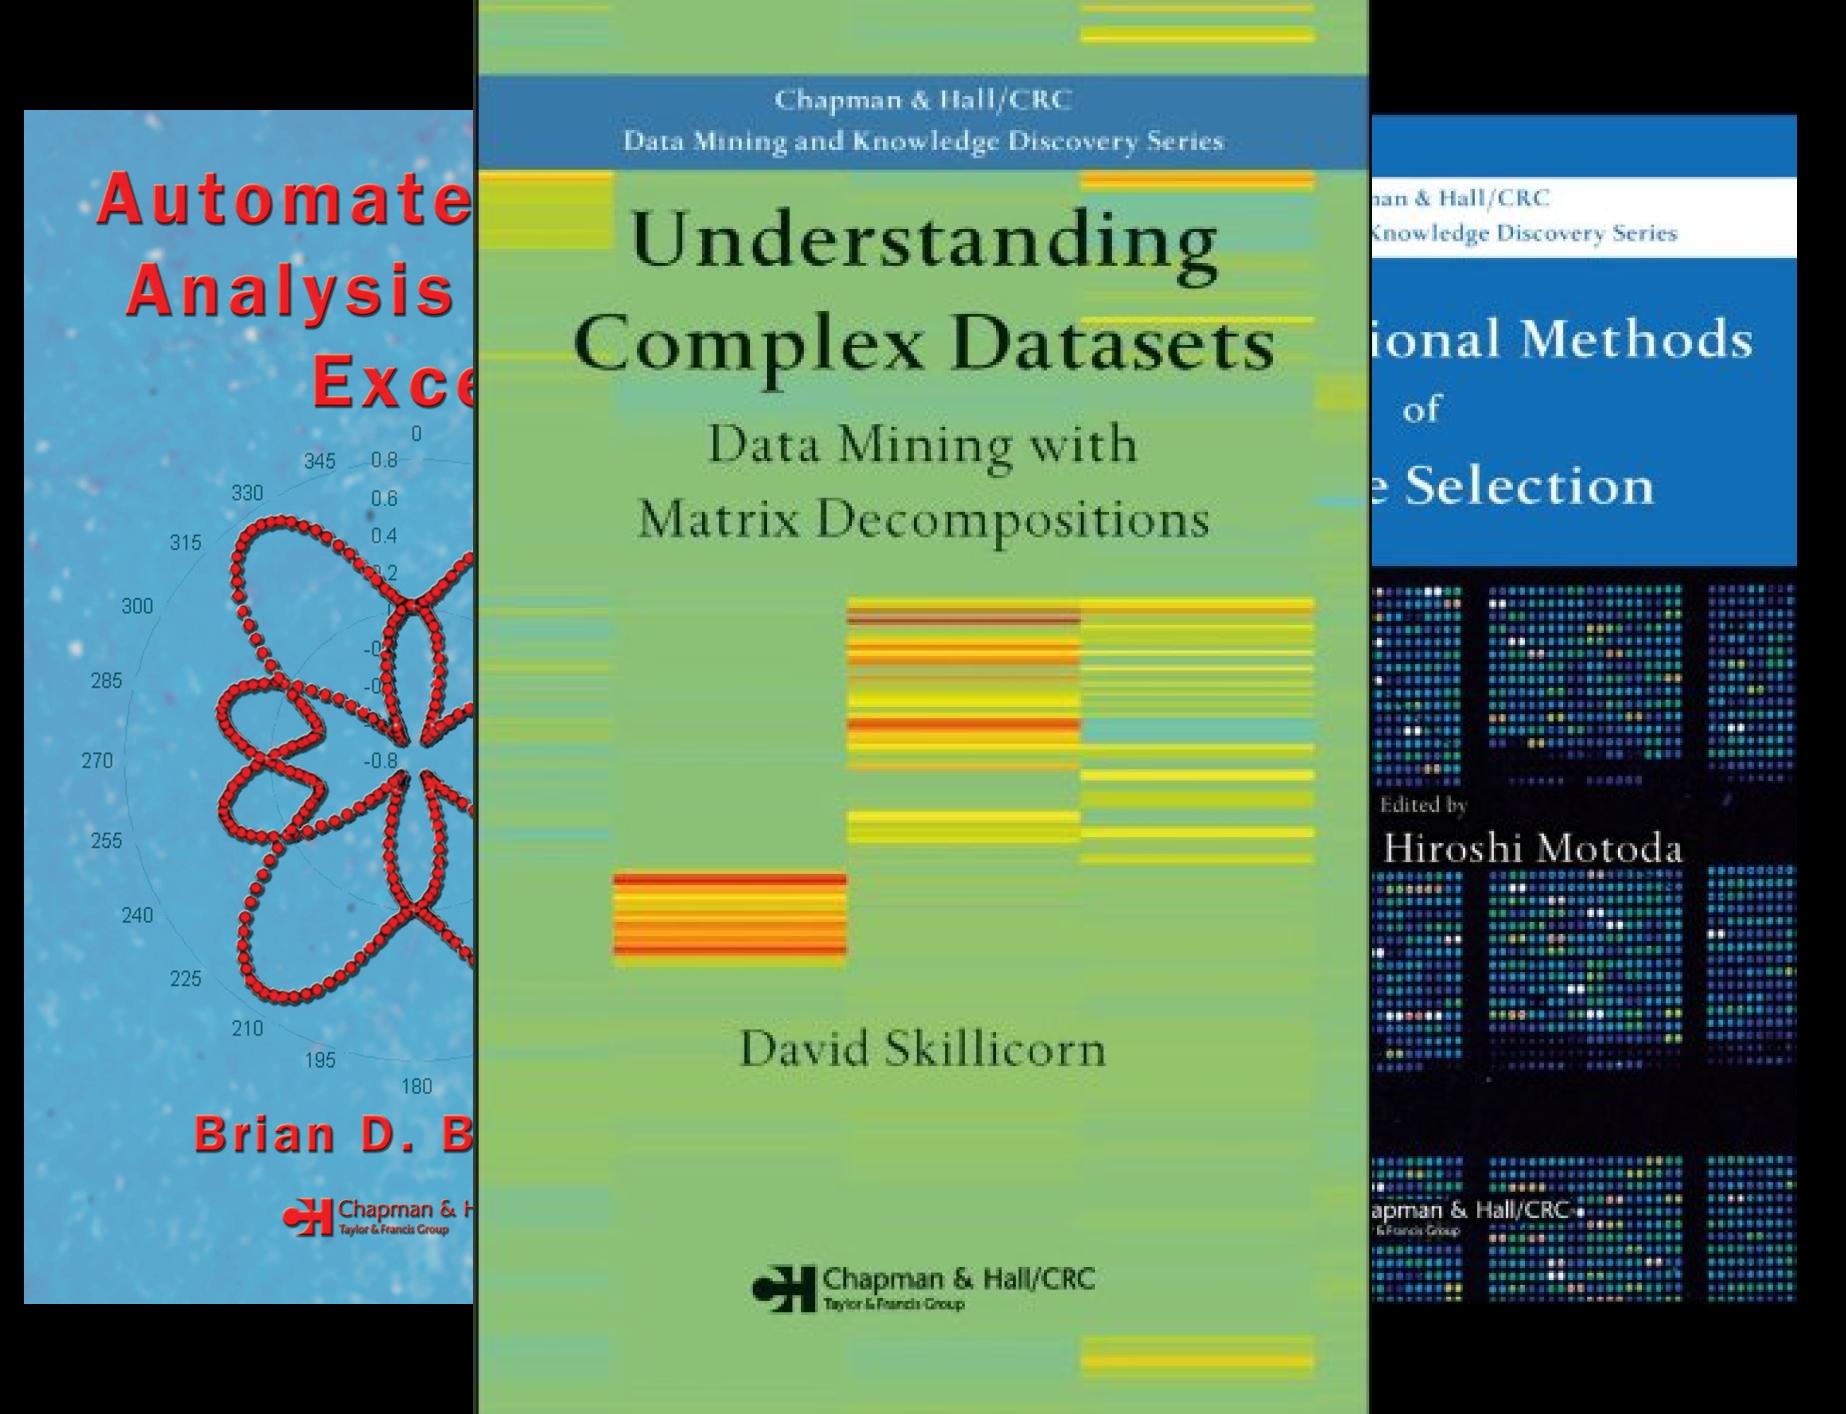 Chapman & Hall/CRC Data Mining and Knowledge